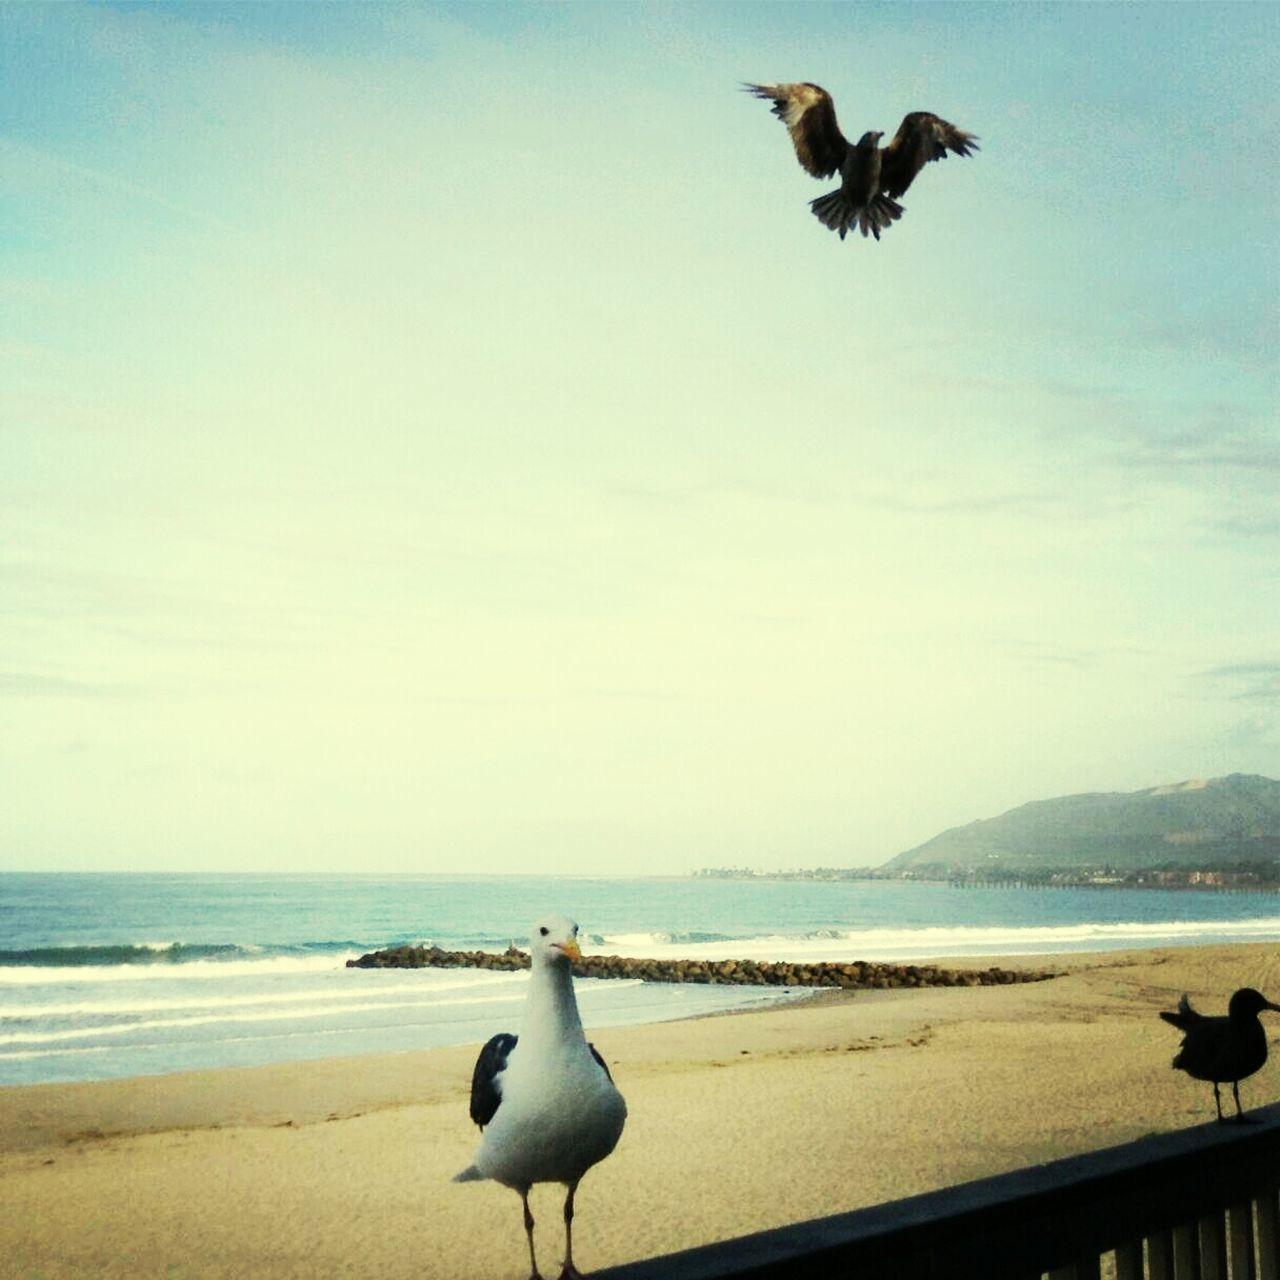 Seagulls on beach